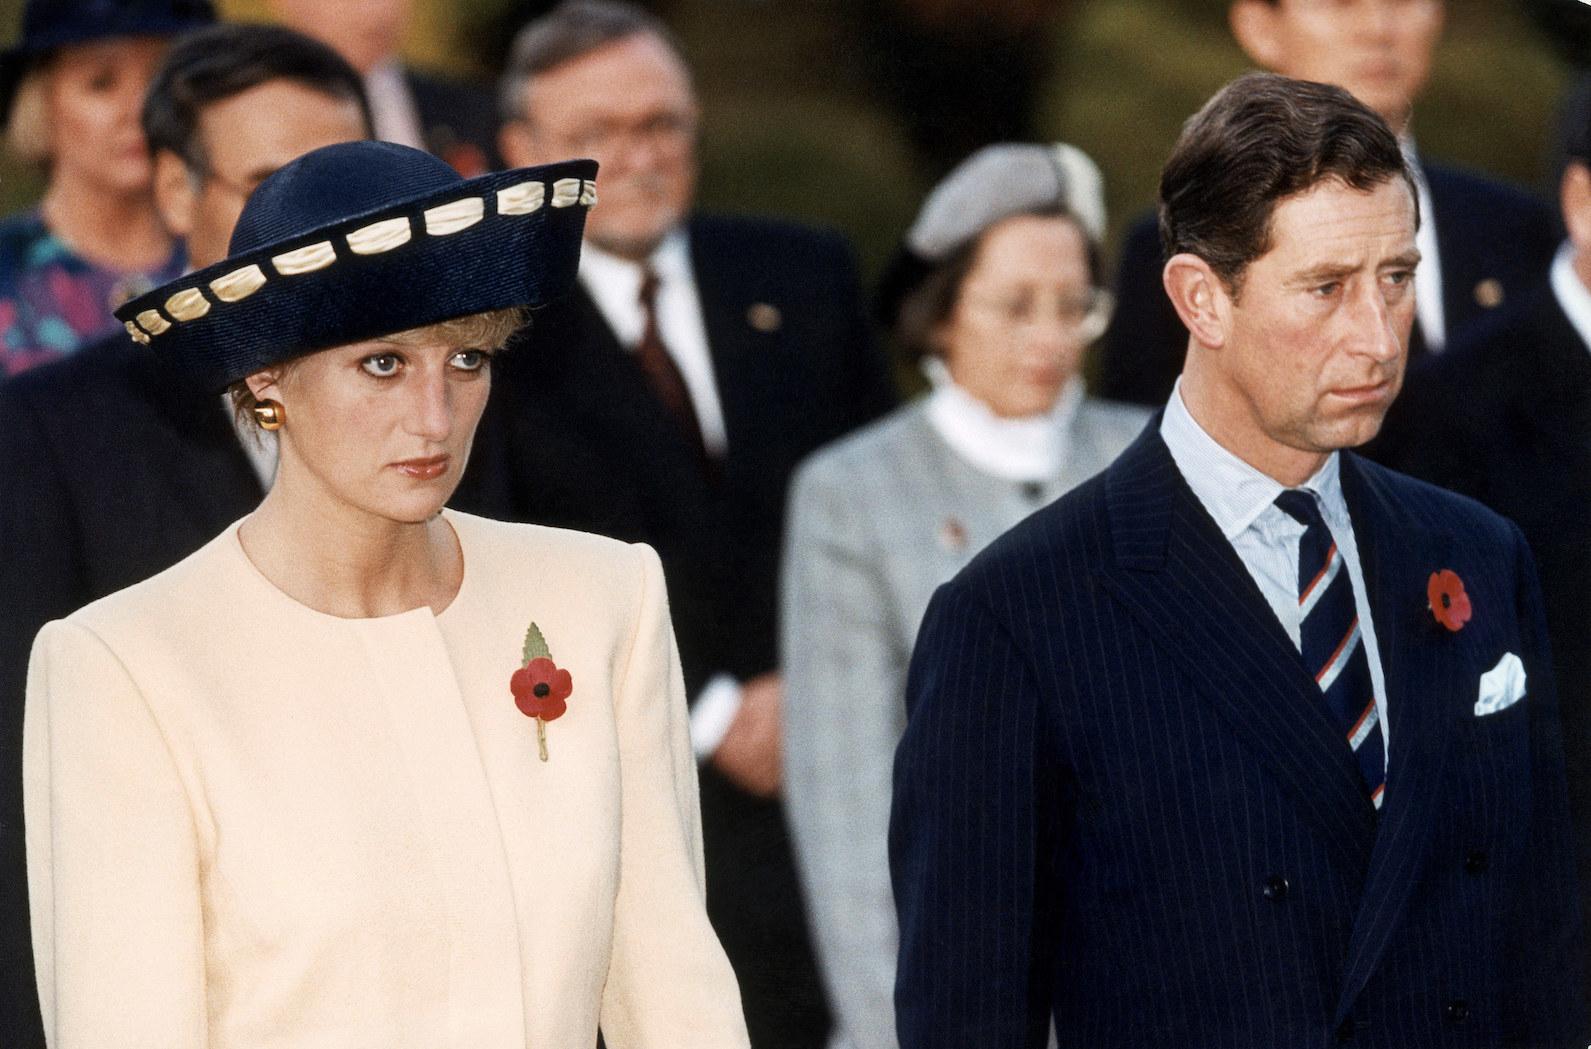 Princess Di and Prince Charles looking upset in 1992